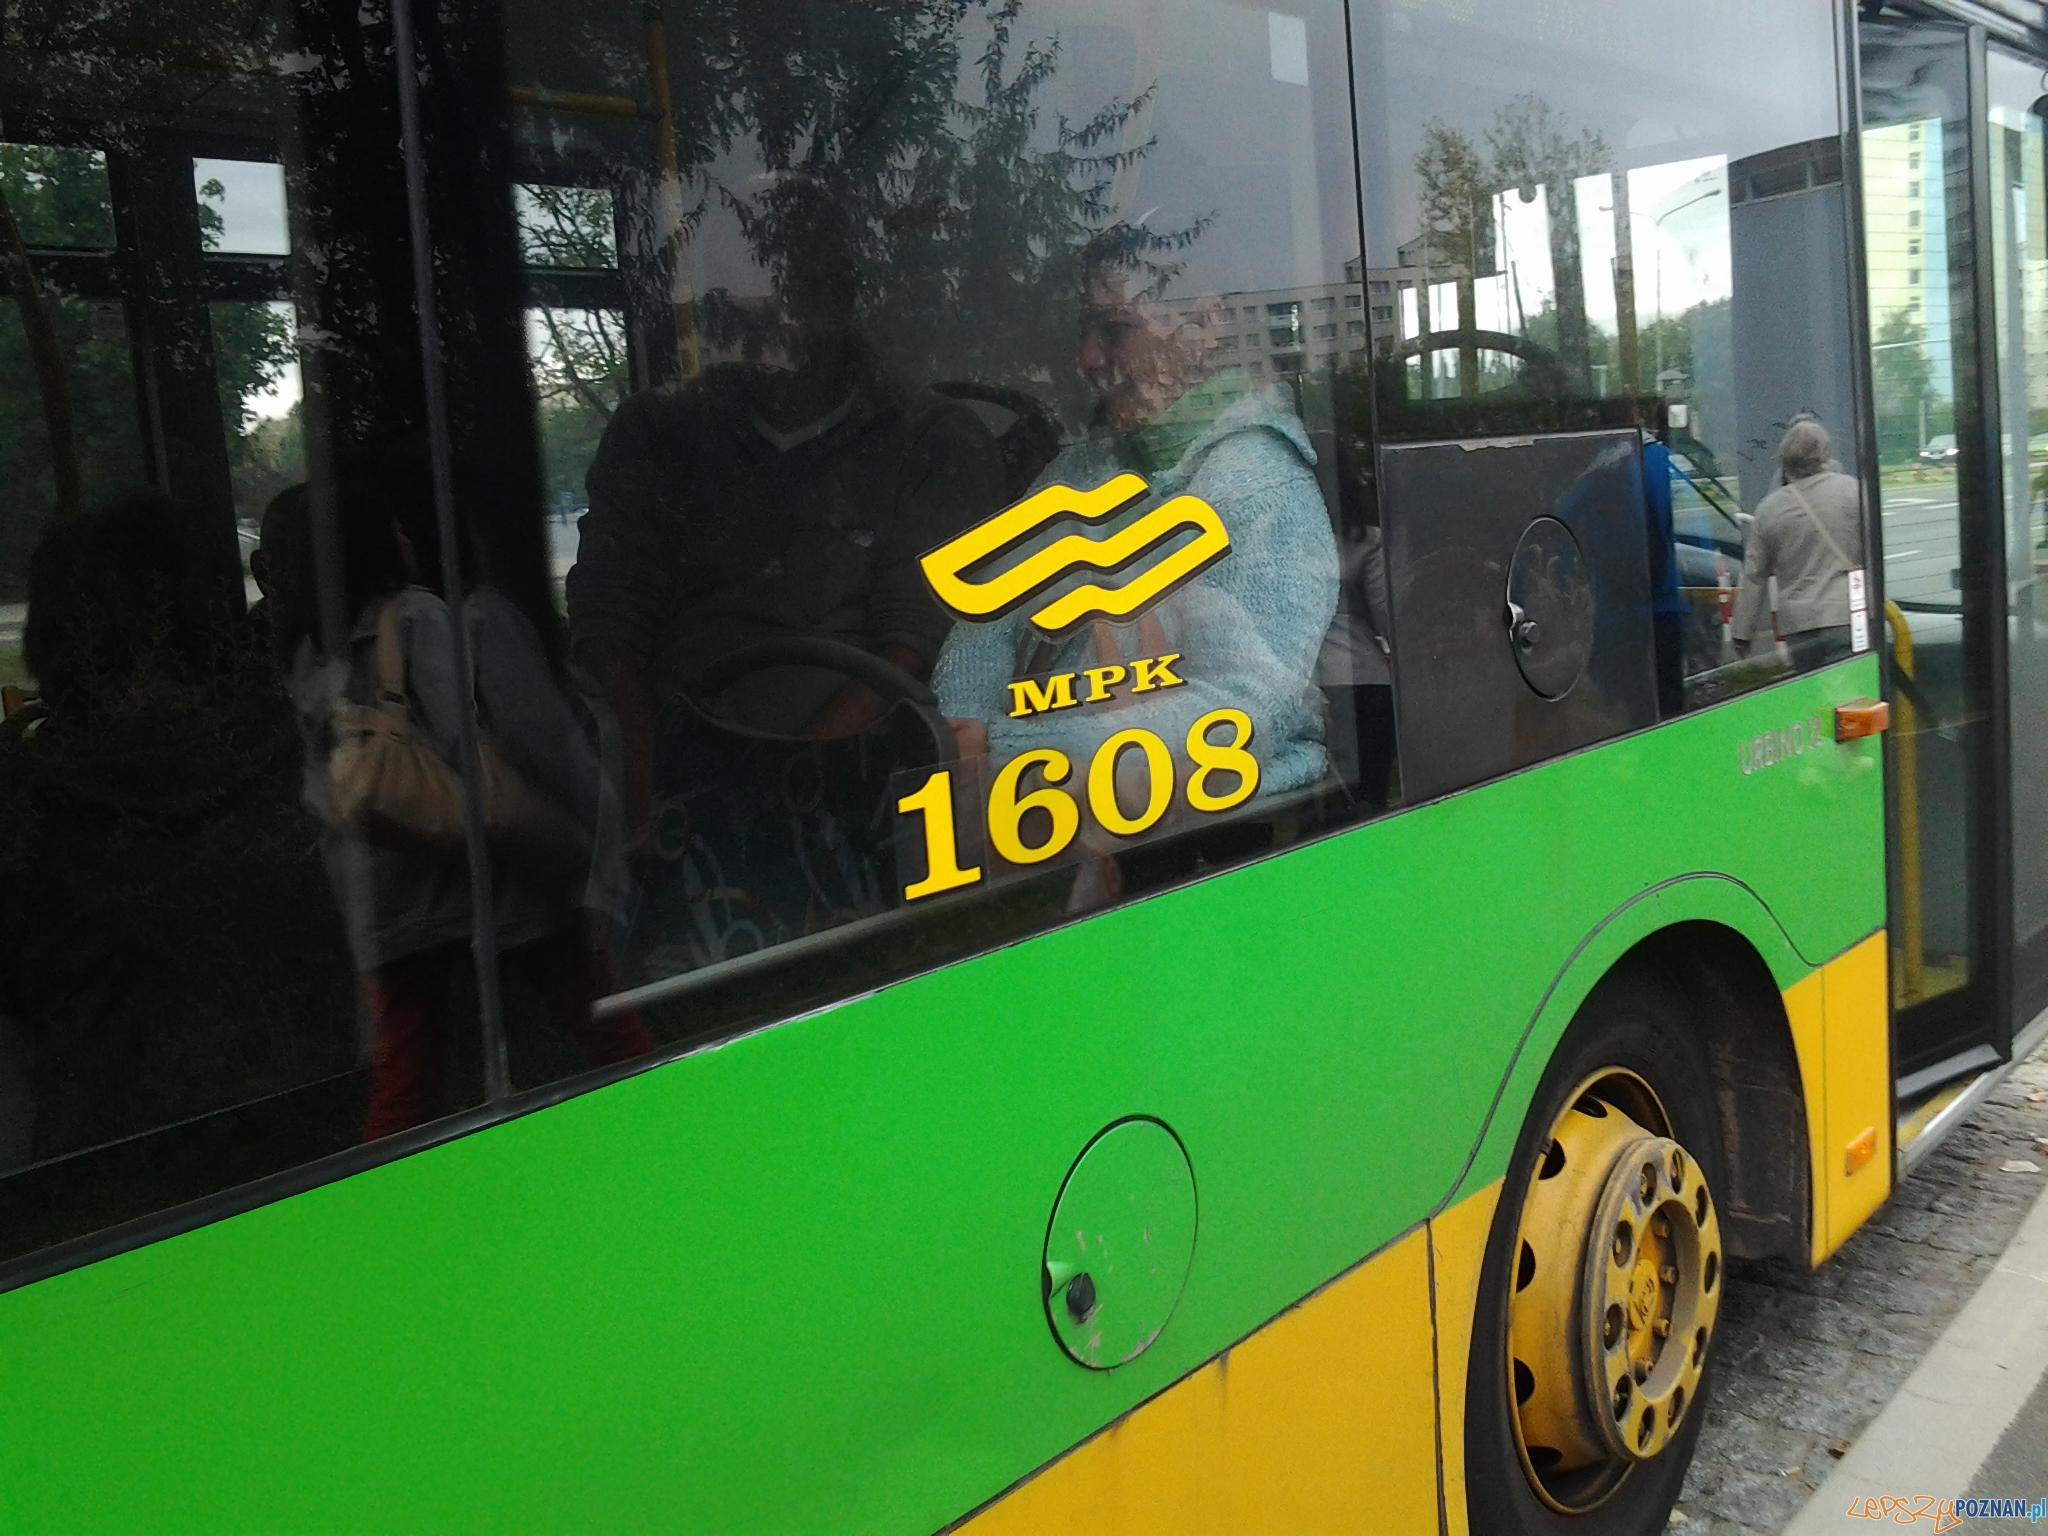 autobus  Foto: lepszyPOZNAN.pl / gsm